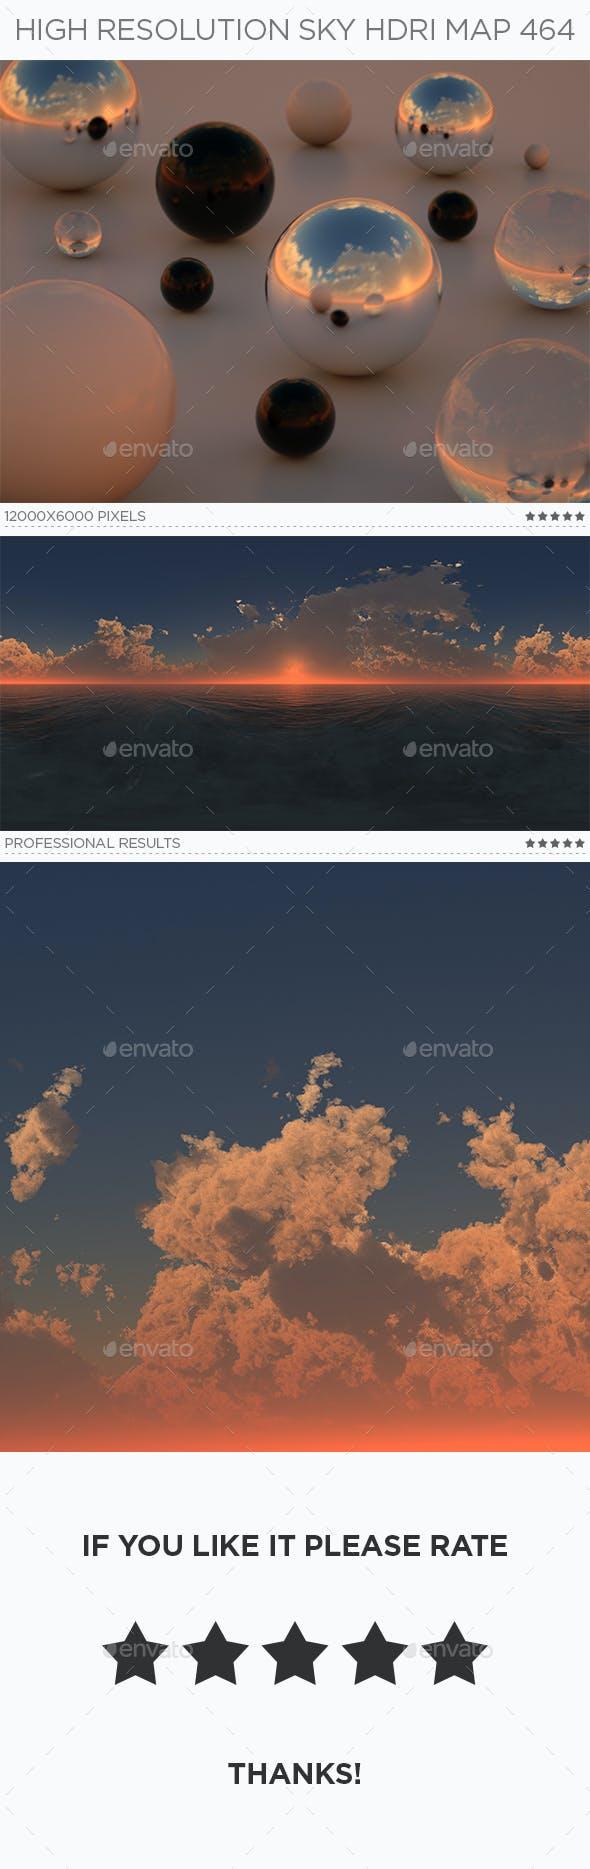 High Resolution Sky HDRi Map 464 - 3DOcean Item for Sale